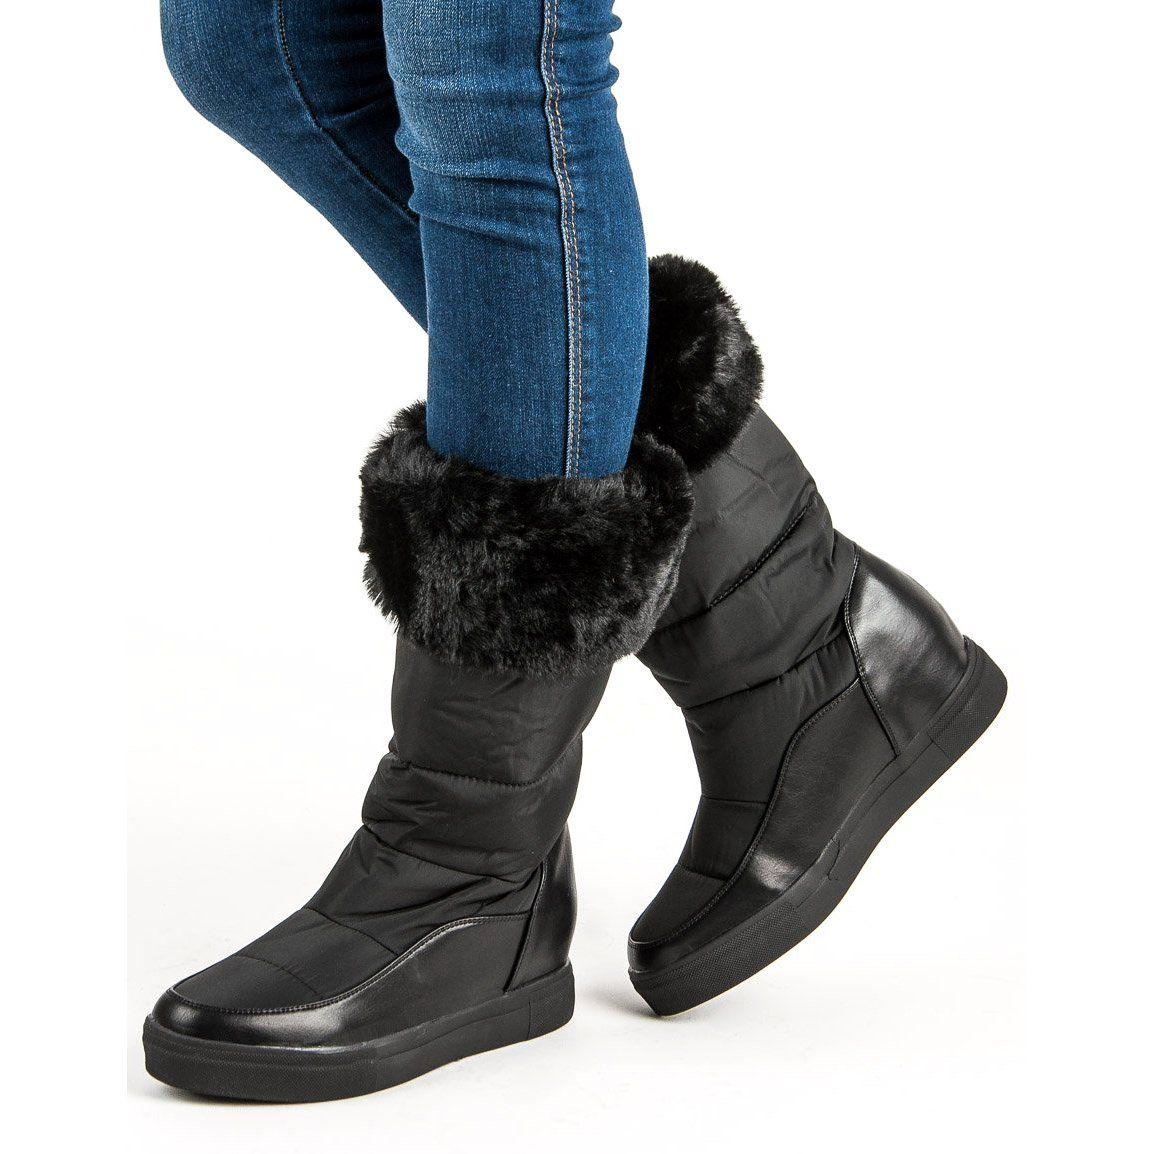 Sniegowce Damskie Seastar Seastar Czarne Sniegowce Z Futerkiem Shoes Winter Boot Boots